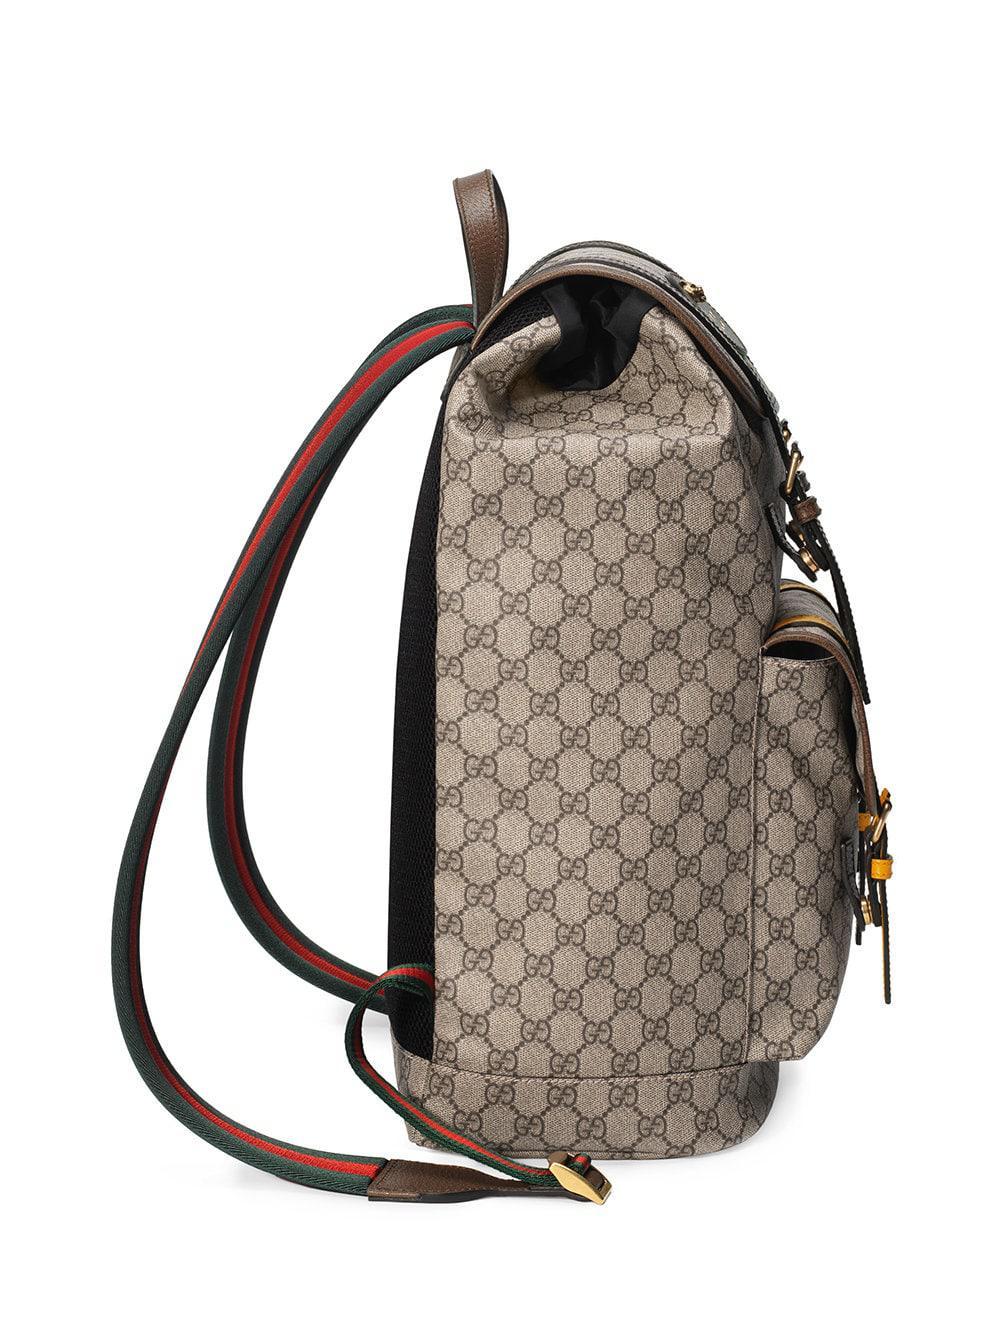 83d281ba4debce Gucci Zaino 'soft Gg Supreme' for Men - Save 7% - Lyst